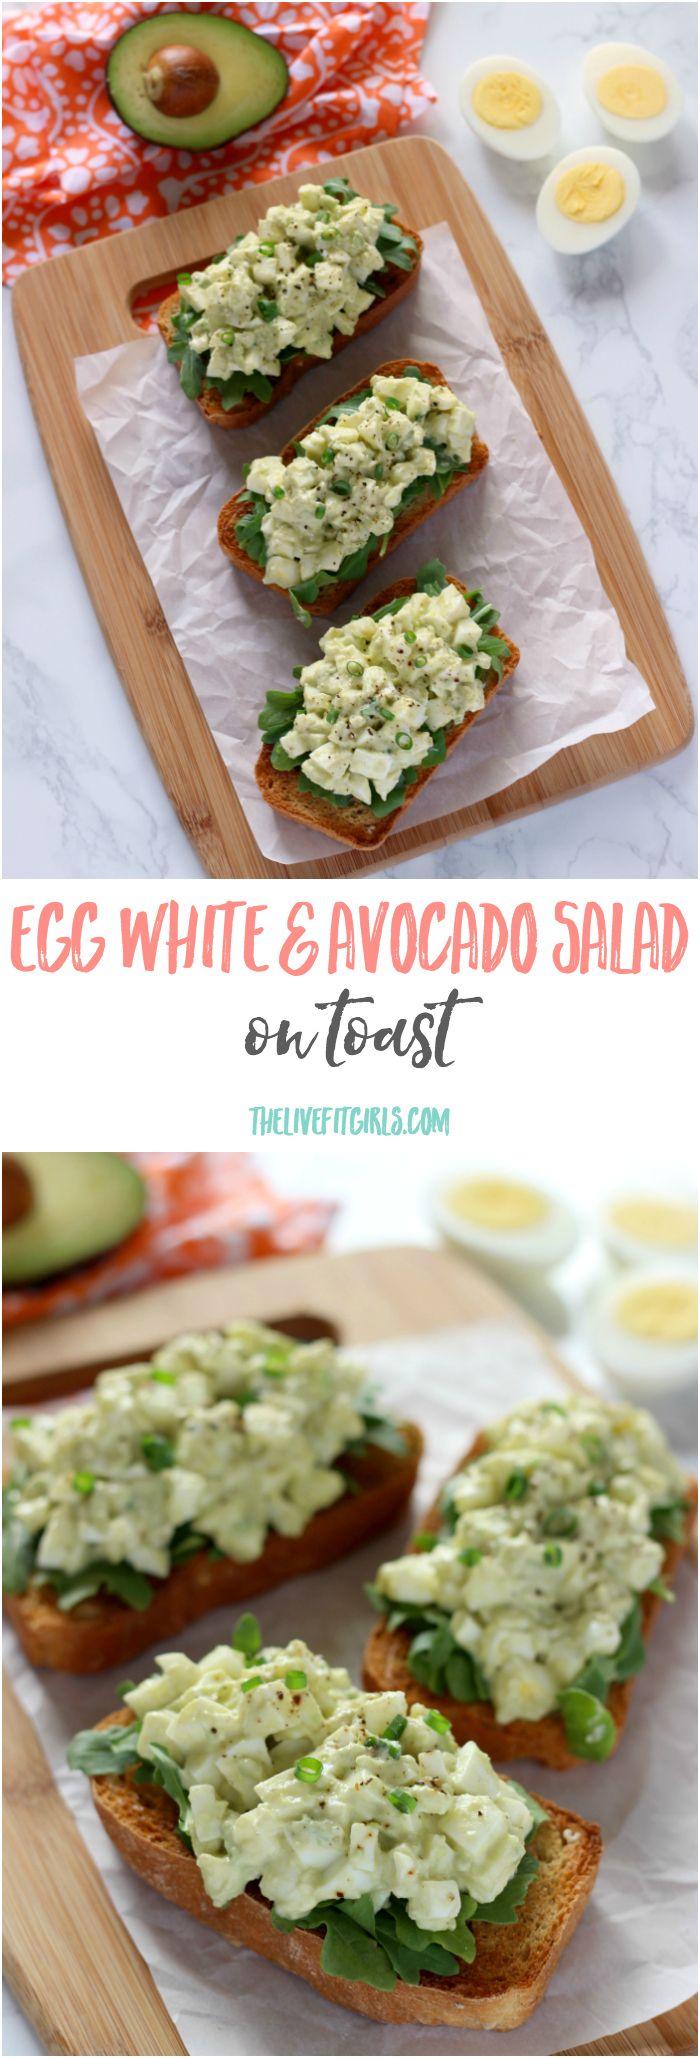 Simple 5 minute egg white & avocado salad...tastes so amazing on fresh baked bread! YUM